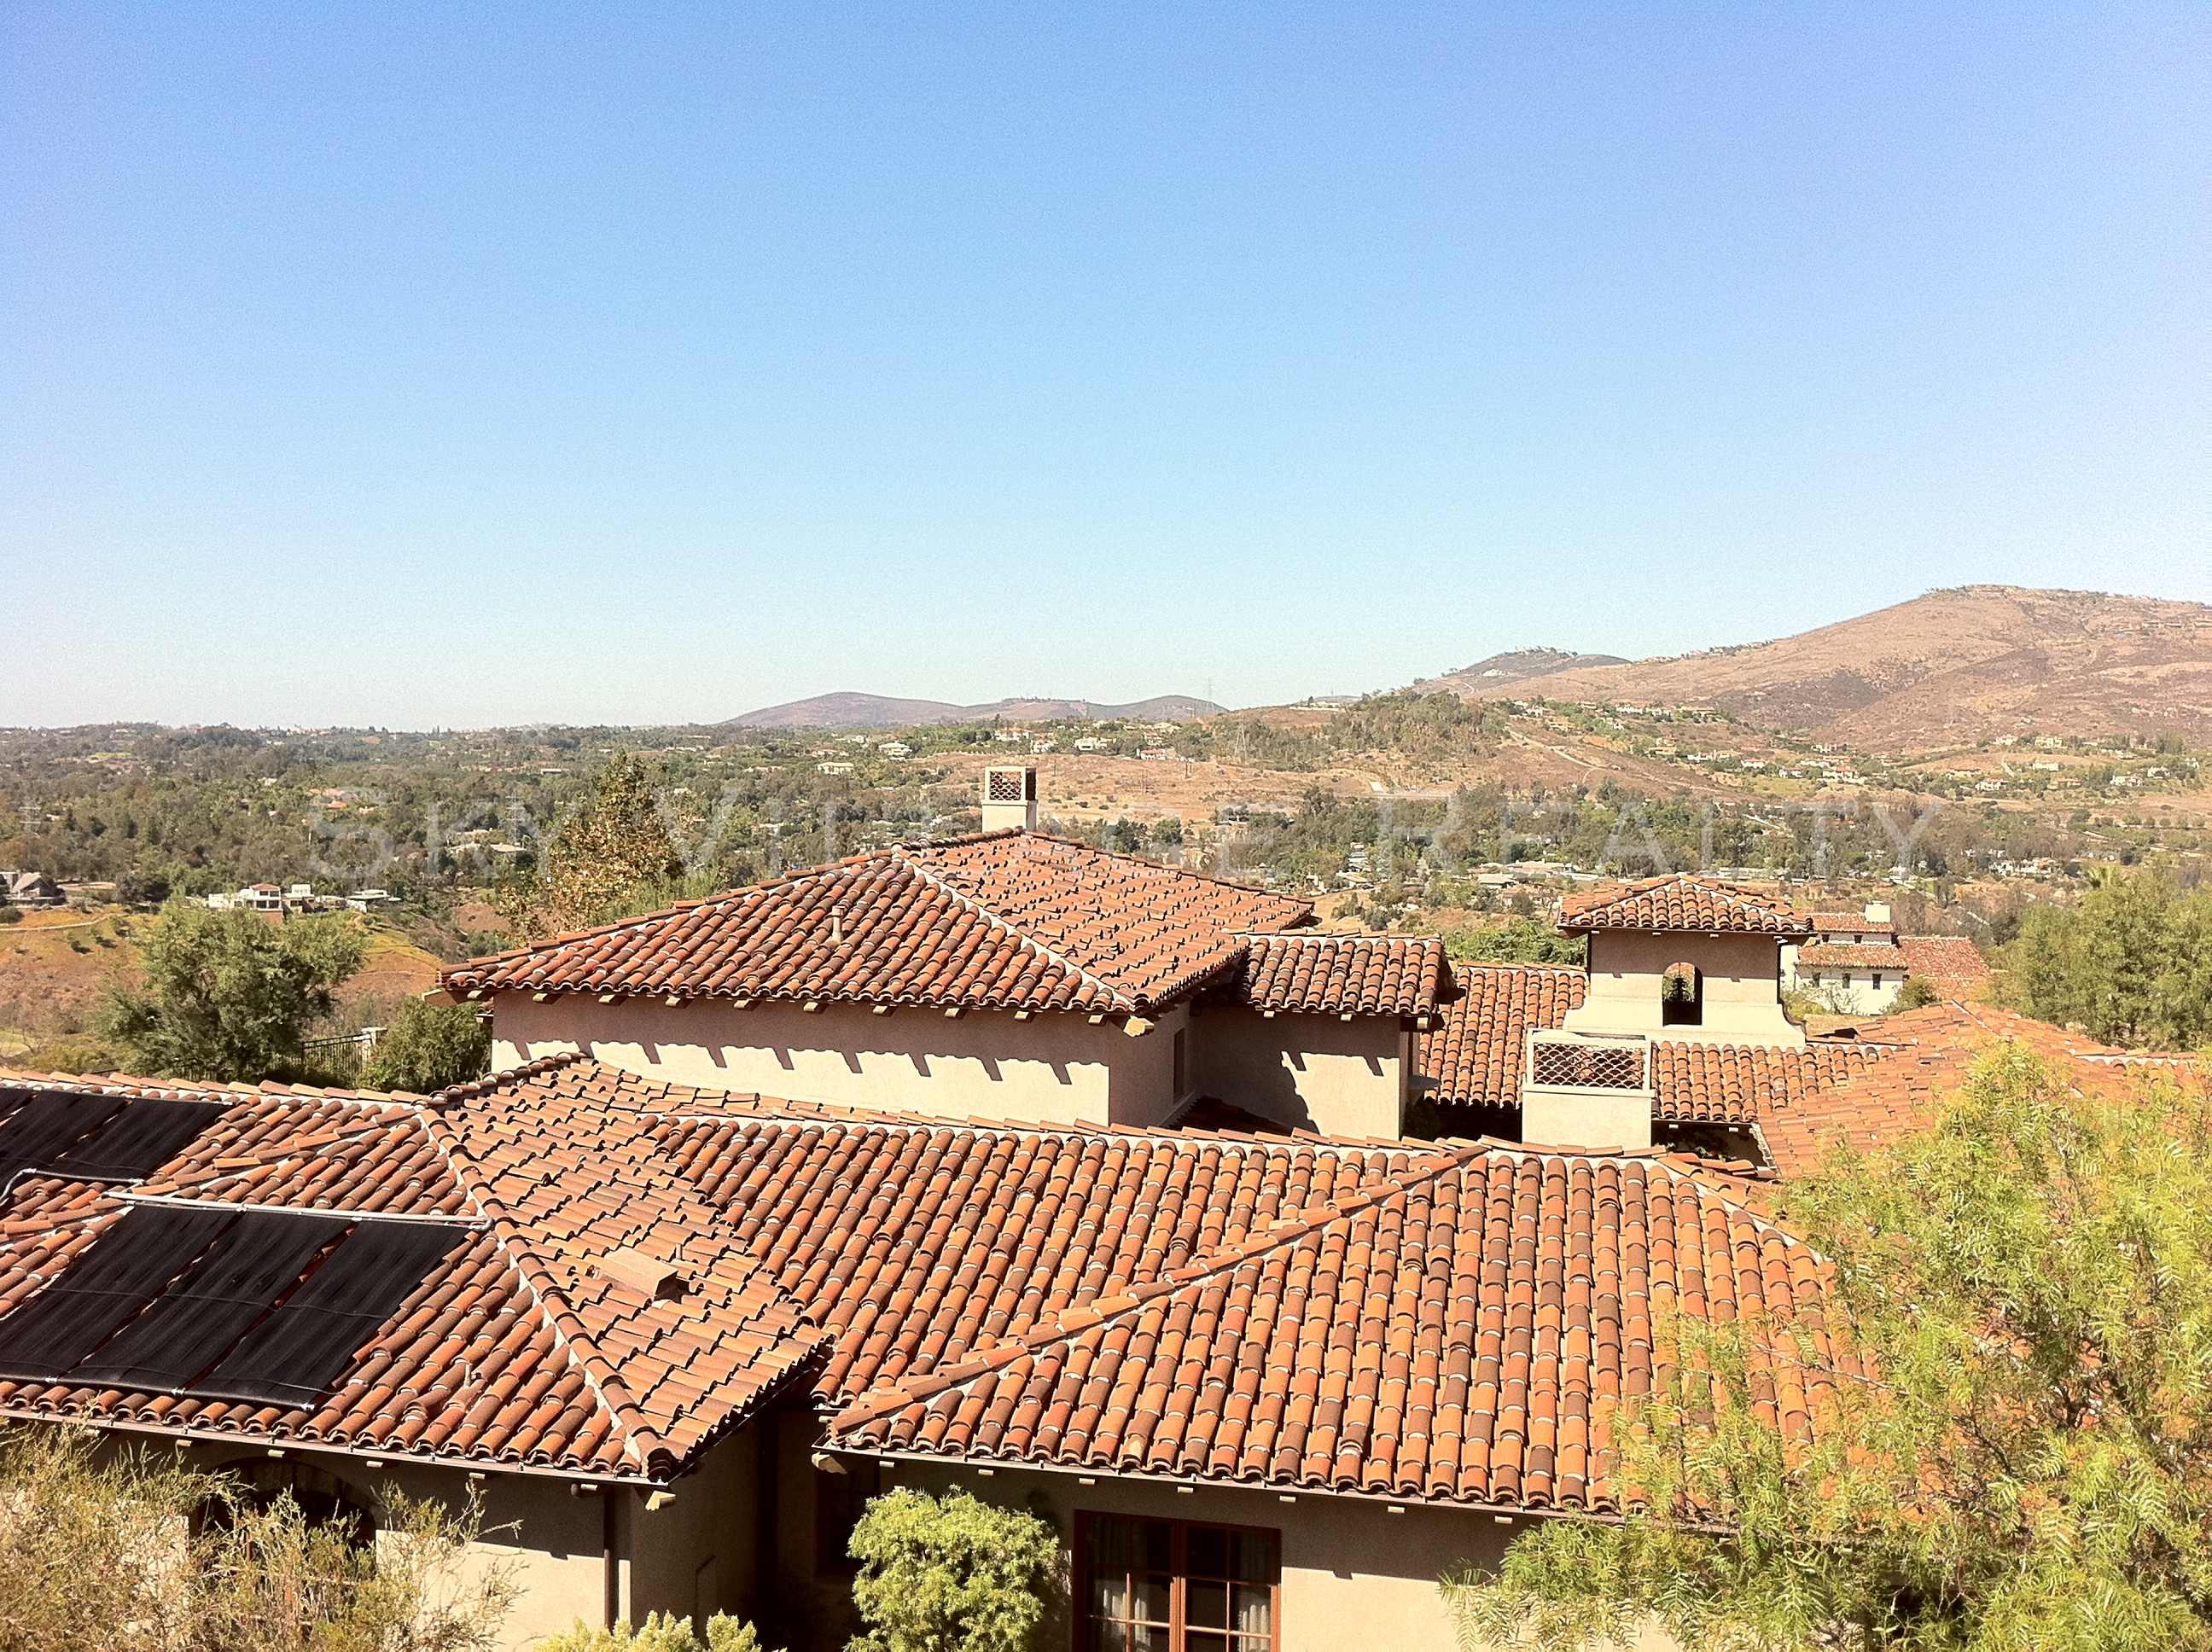 The Bridges Homes in Rancho Santa Fe